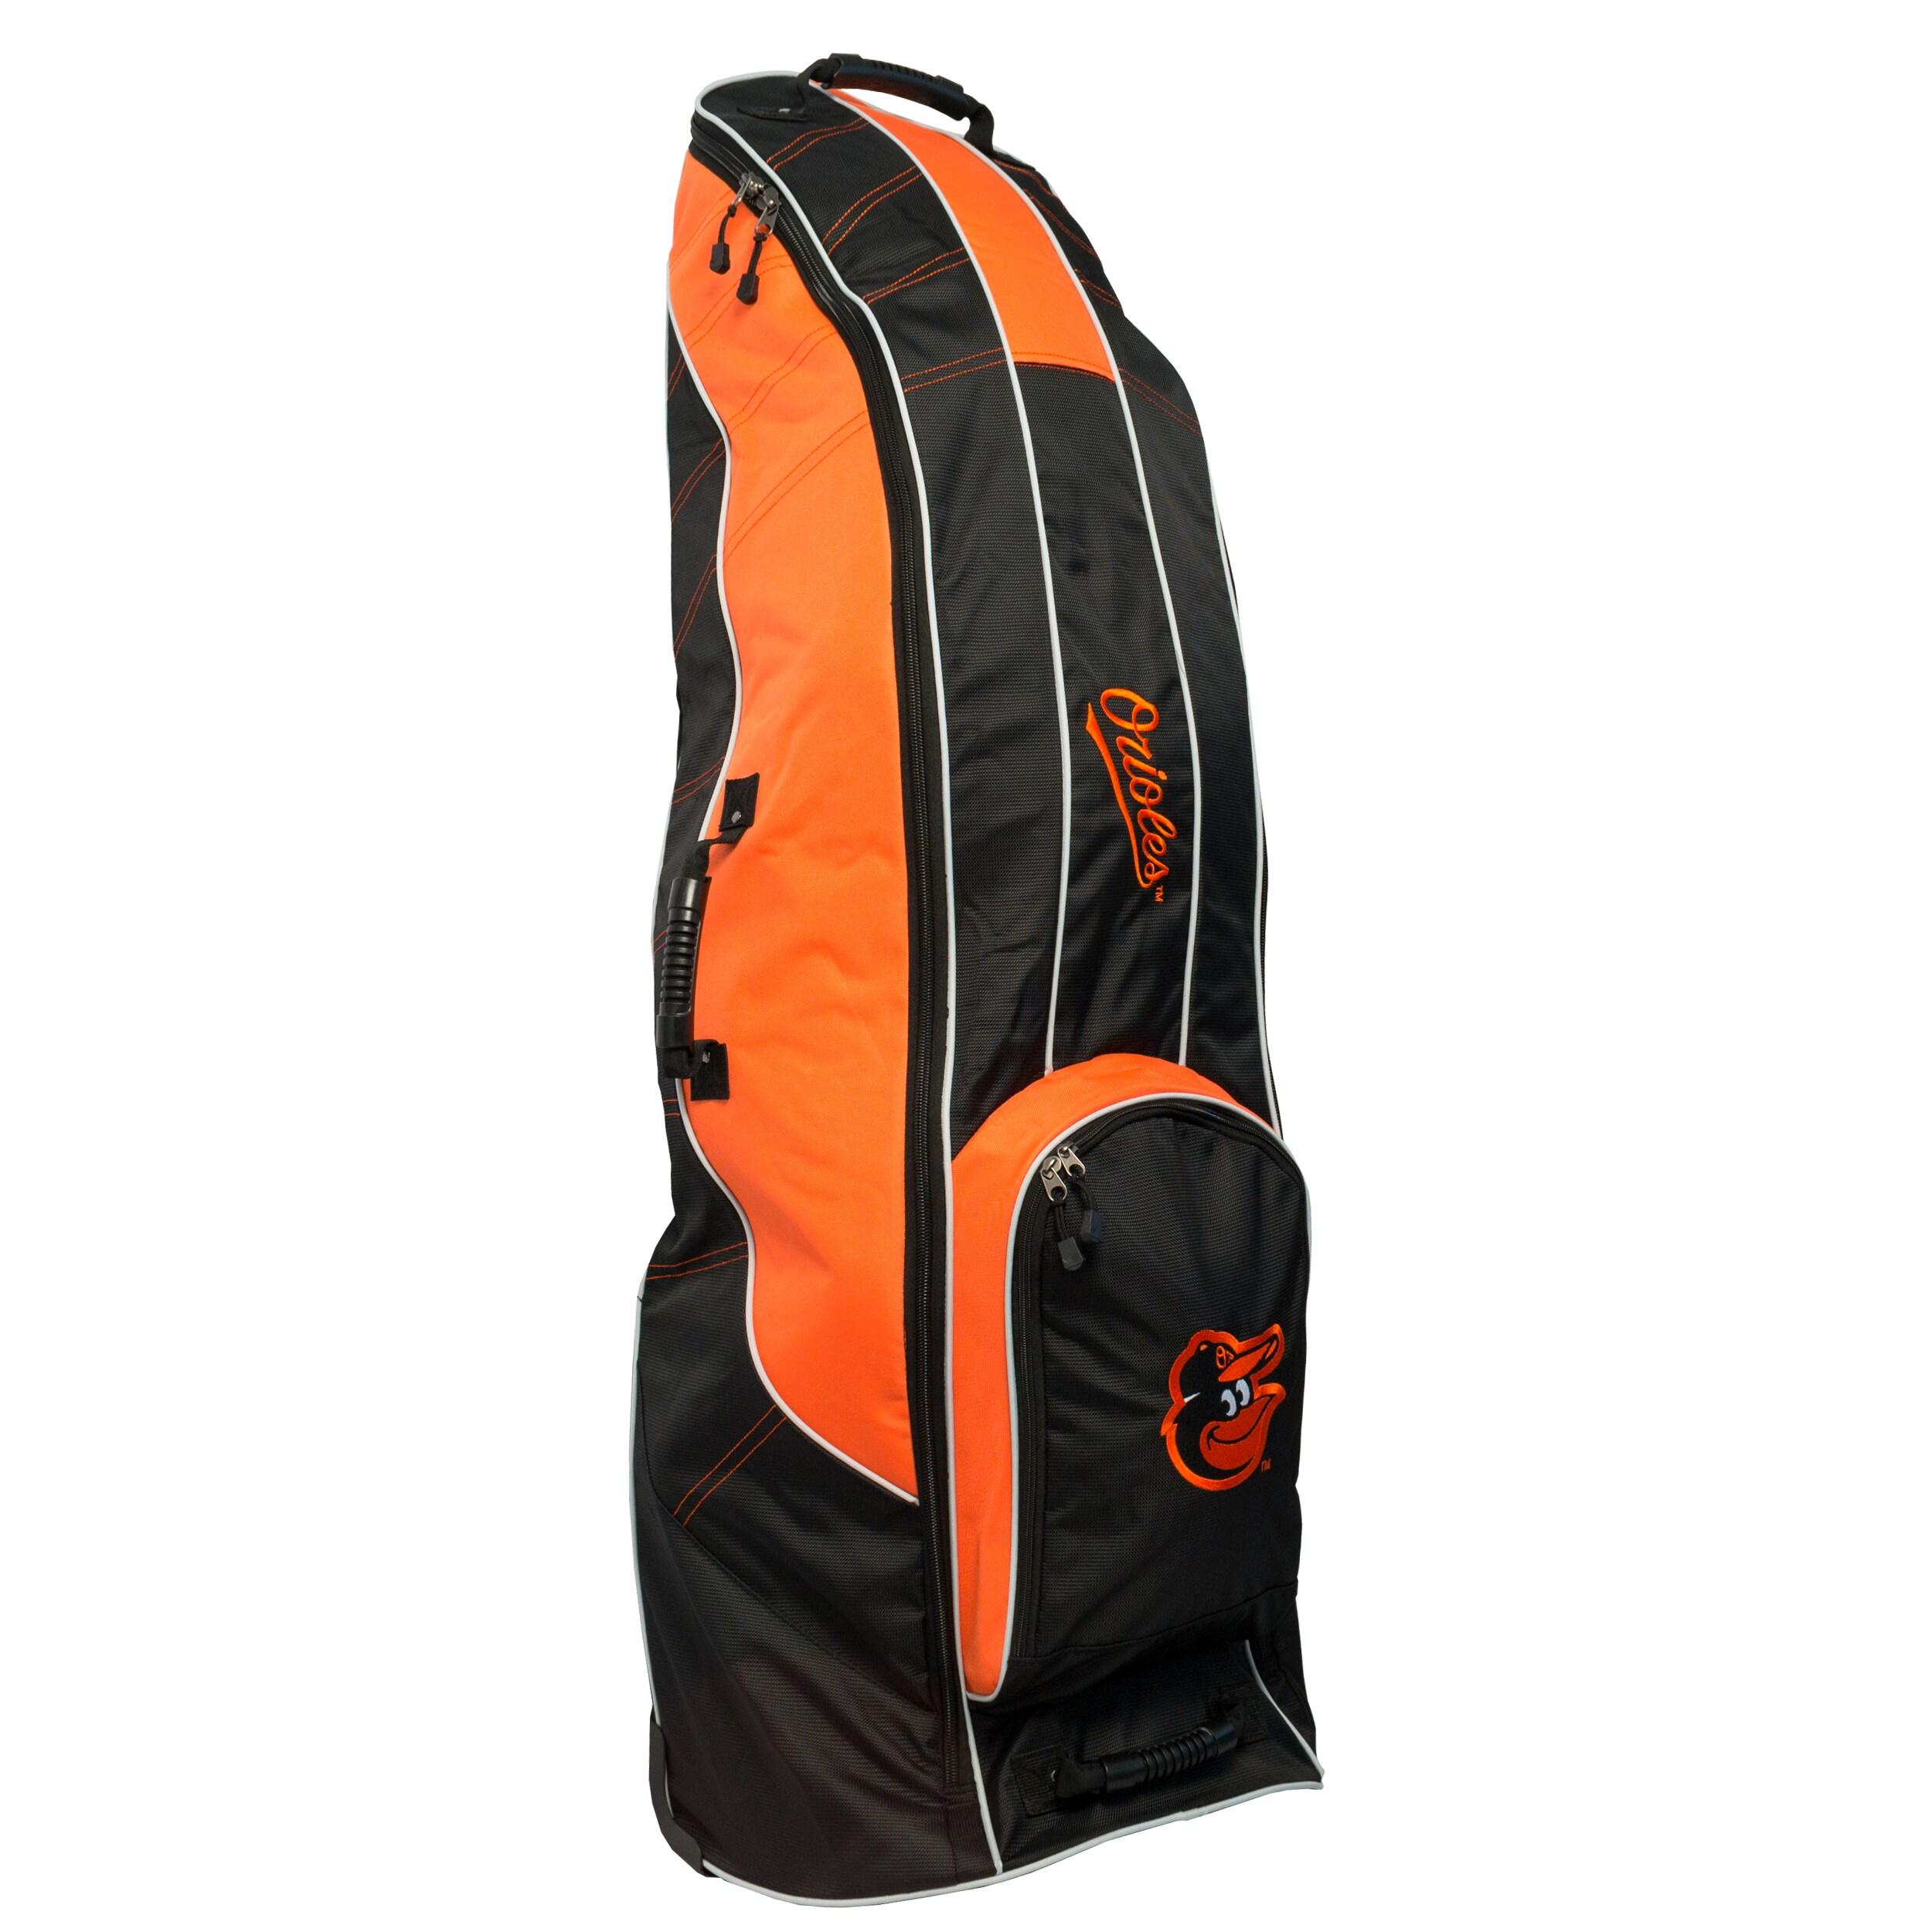 Baltimore Orioles Team Golf Travel Bag